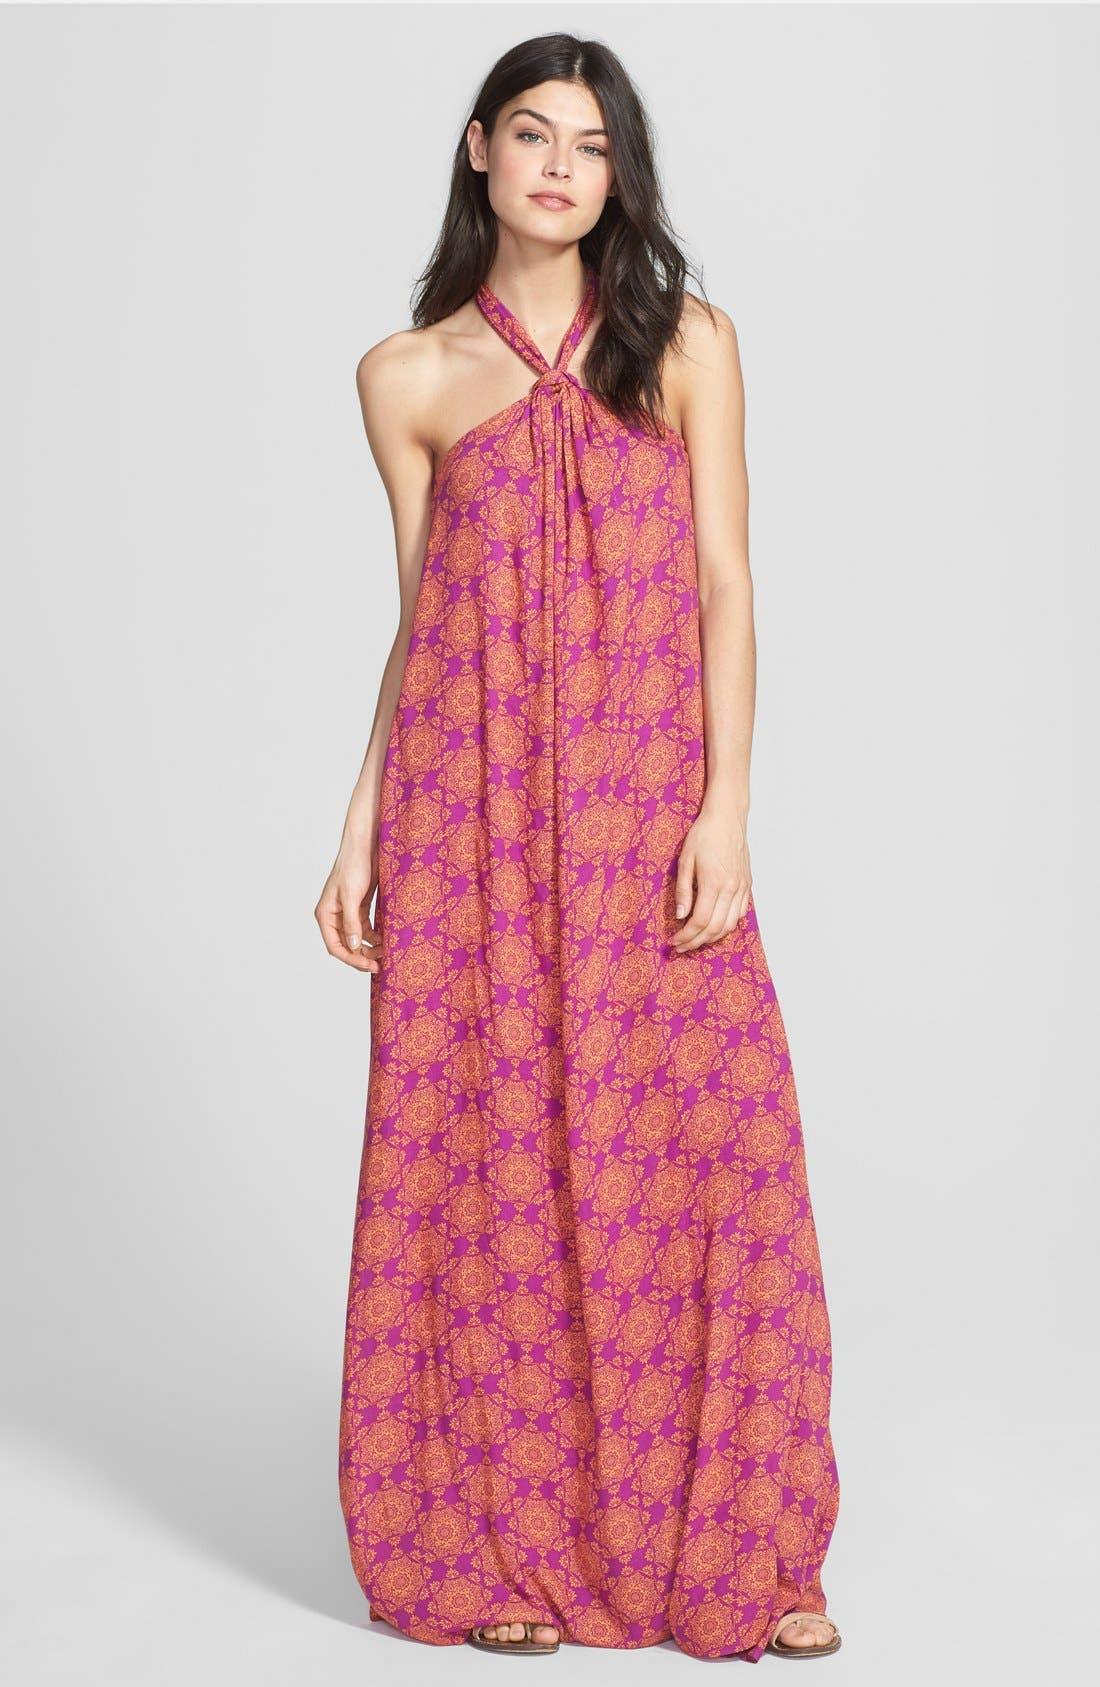 Main Image - Ella Moss 'Moselle' Print Halter Maxi Dress